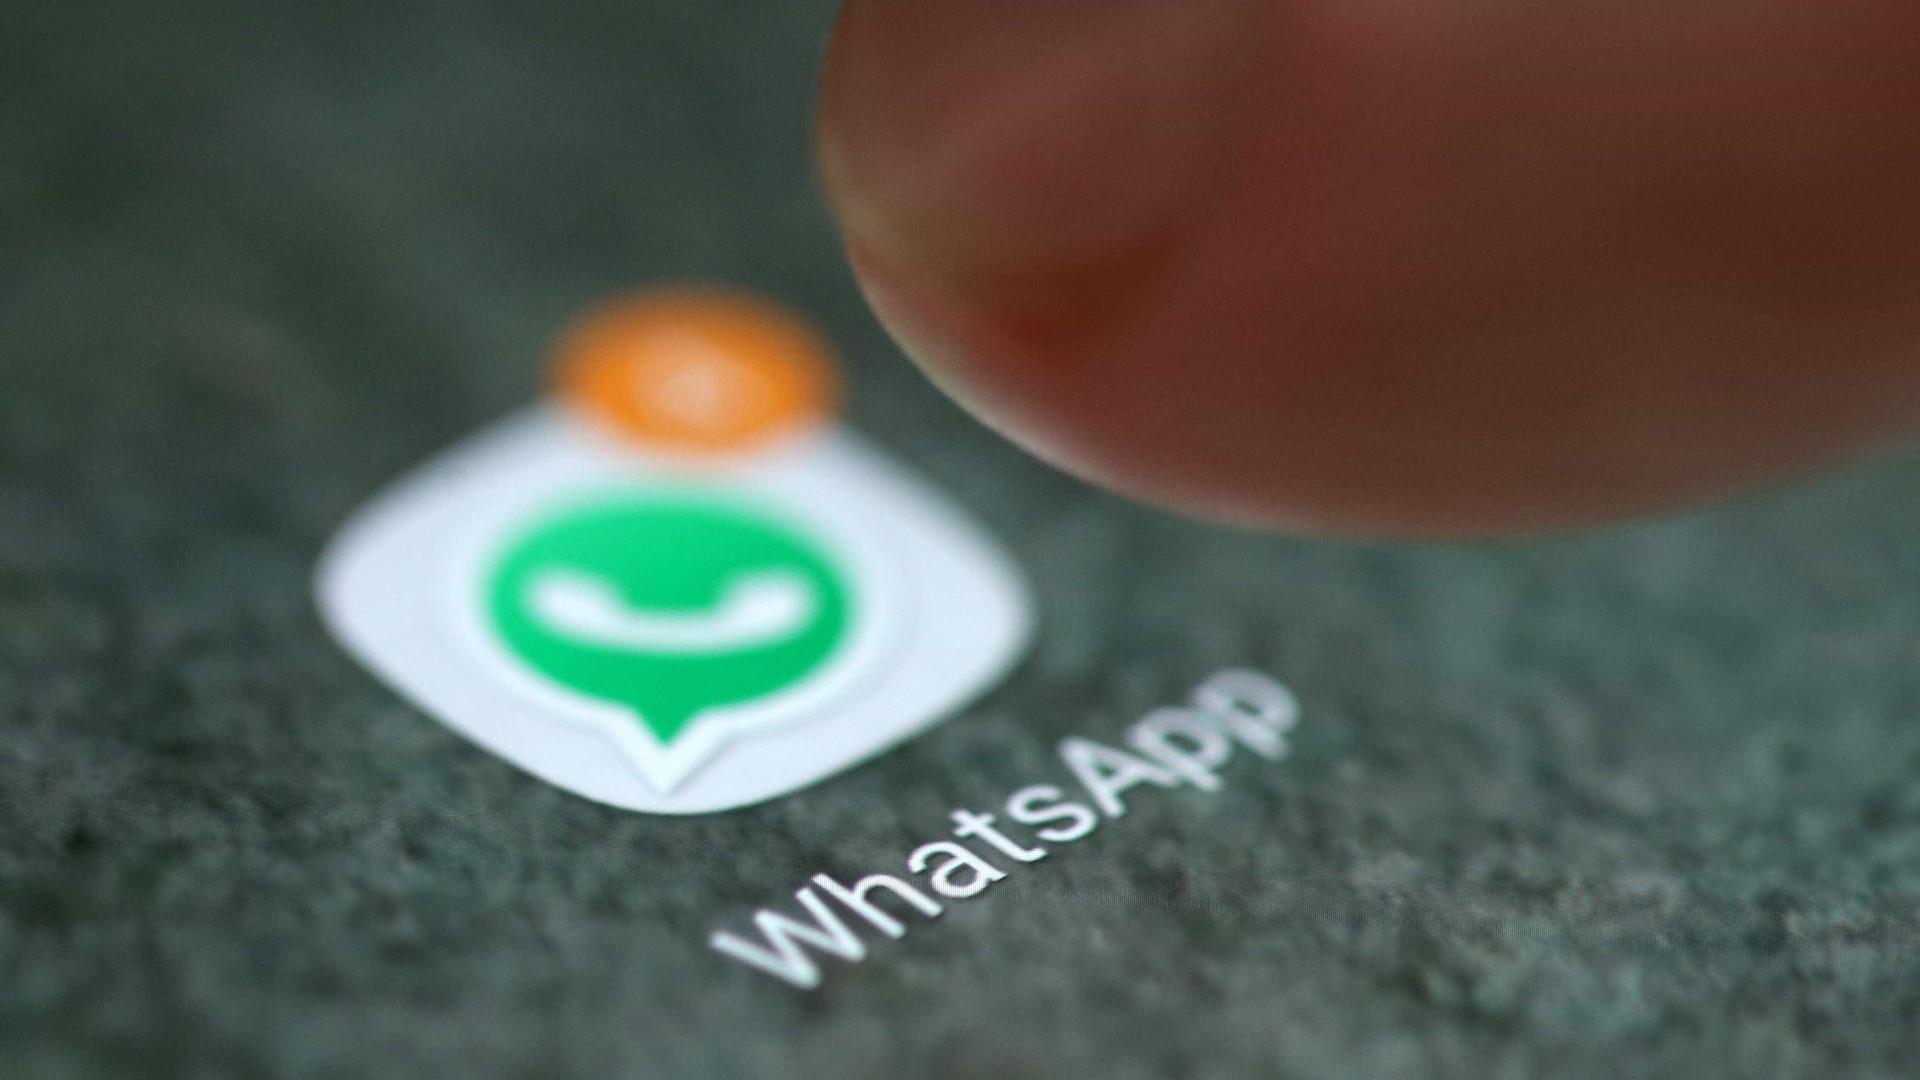 WhatsApp avisa se mensagem enviada foi copiada; entenda